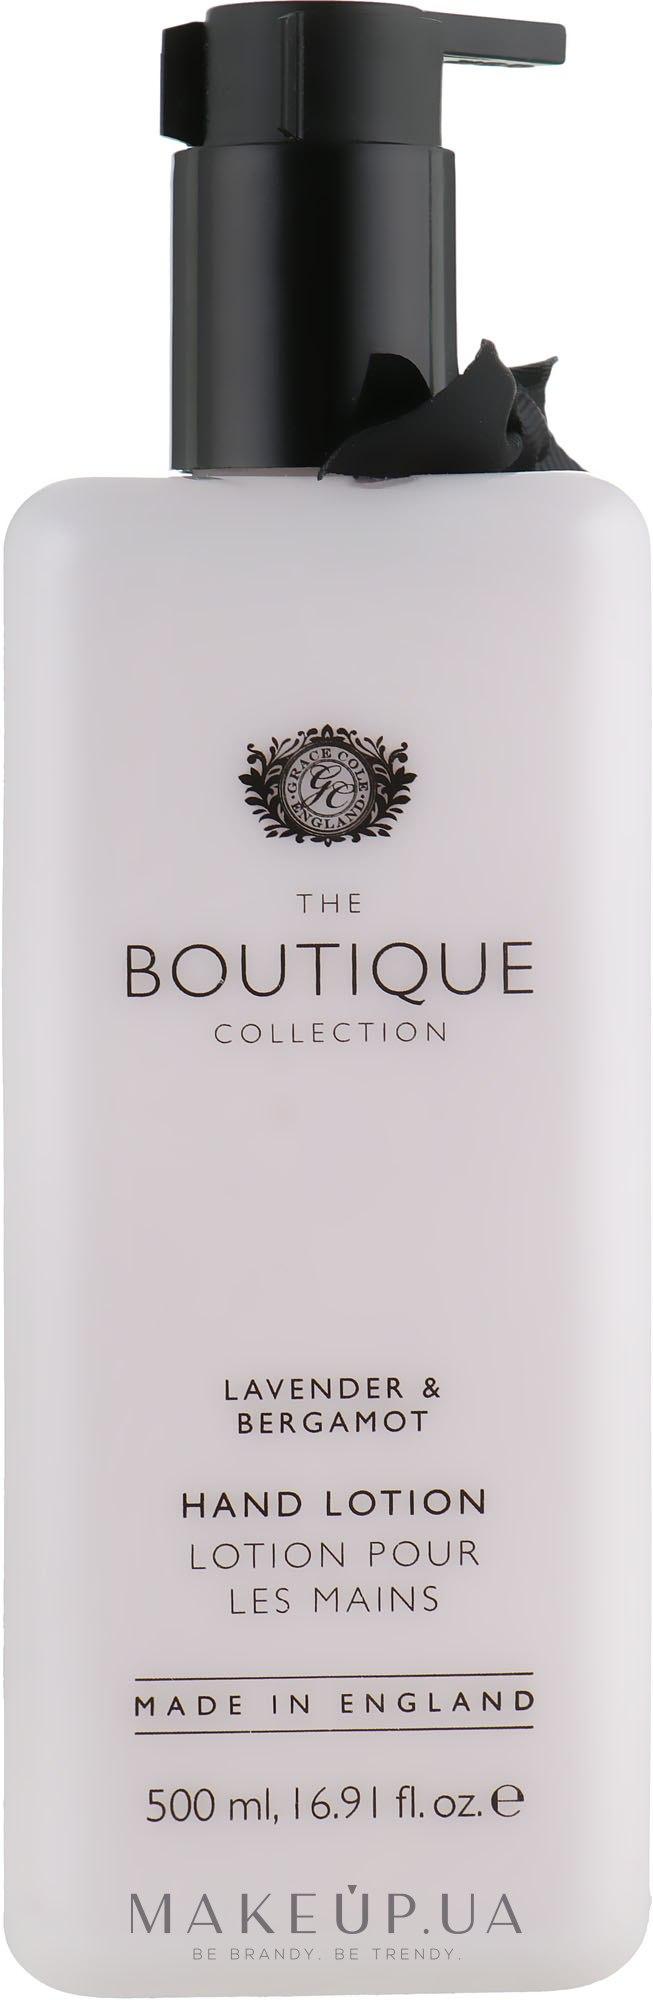 "Лосьон для рук и ногтей ""Лаванда и Бергамот"" - Grace Cole Boutique Hand Lotion Lavender & Bergamot — фото 500ml"